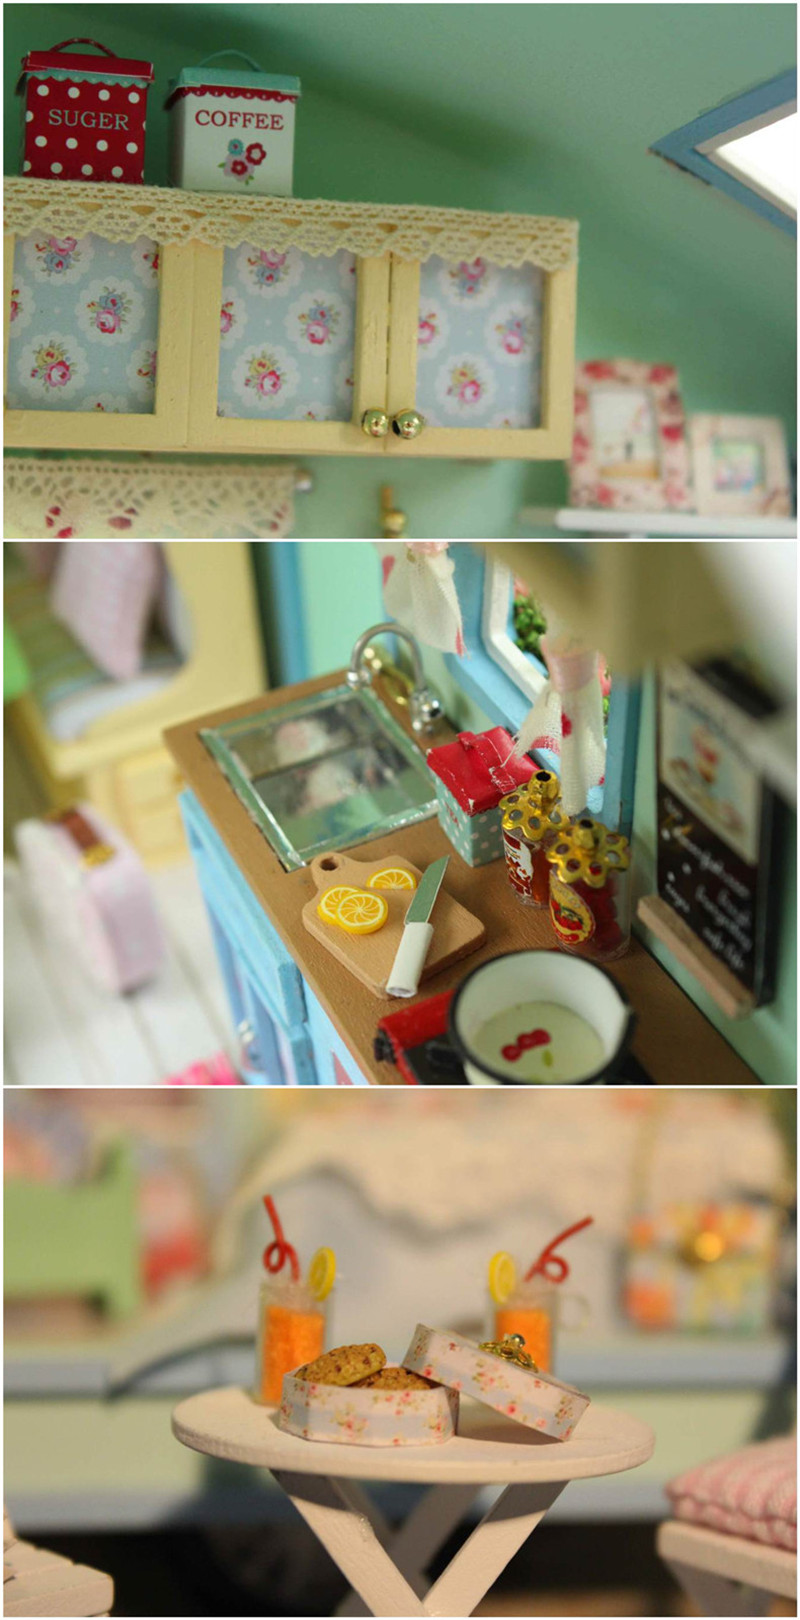 HTB1 vgENVzqK1RjSZFoq6zfcXXaP - Robotime - DIY Models, DIY Miniature Houses, 3d Wooden Puzzle